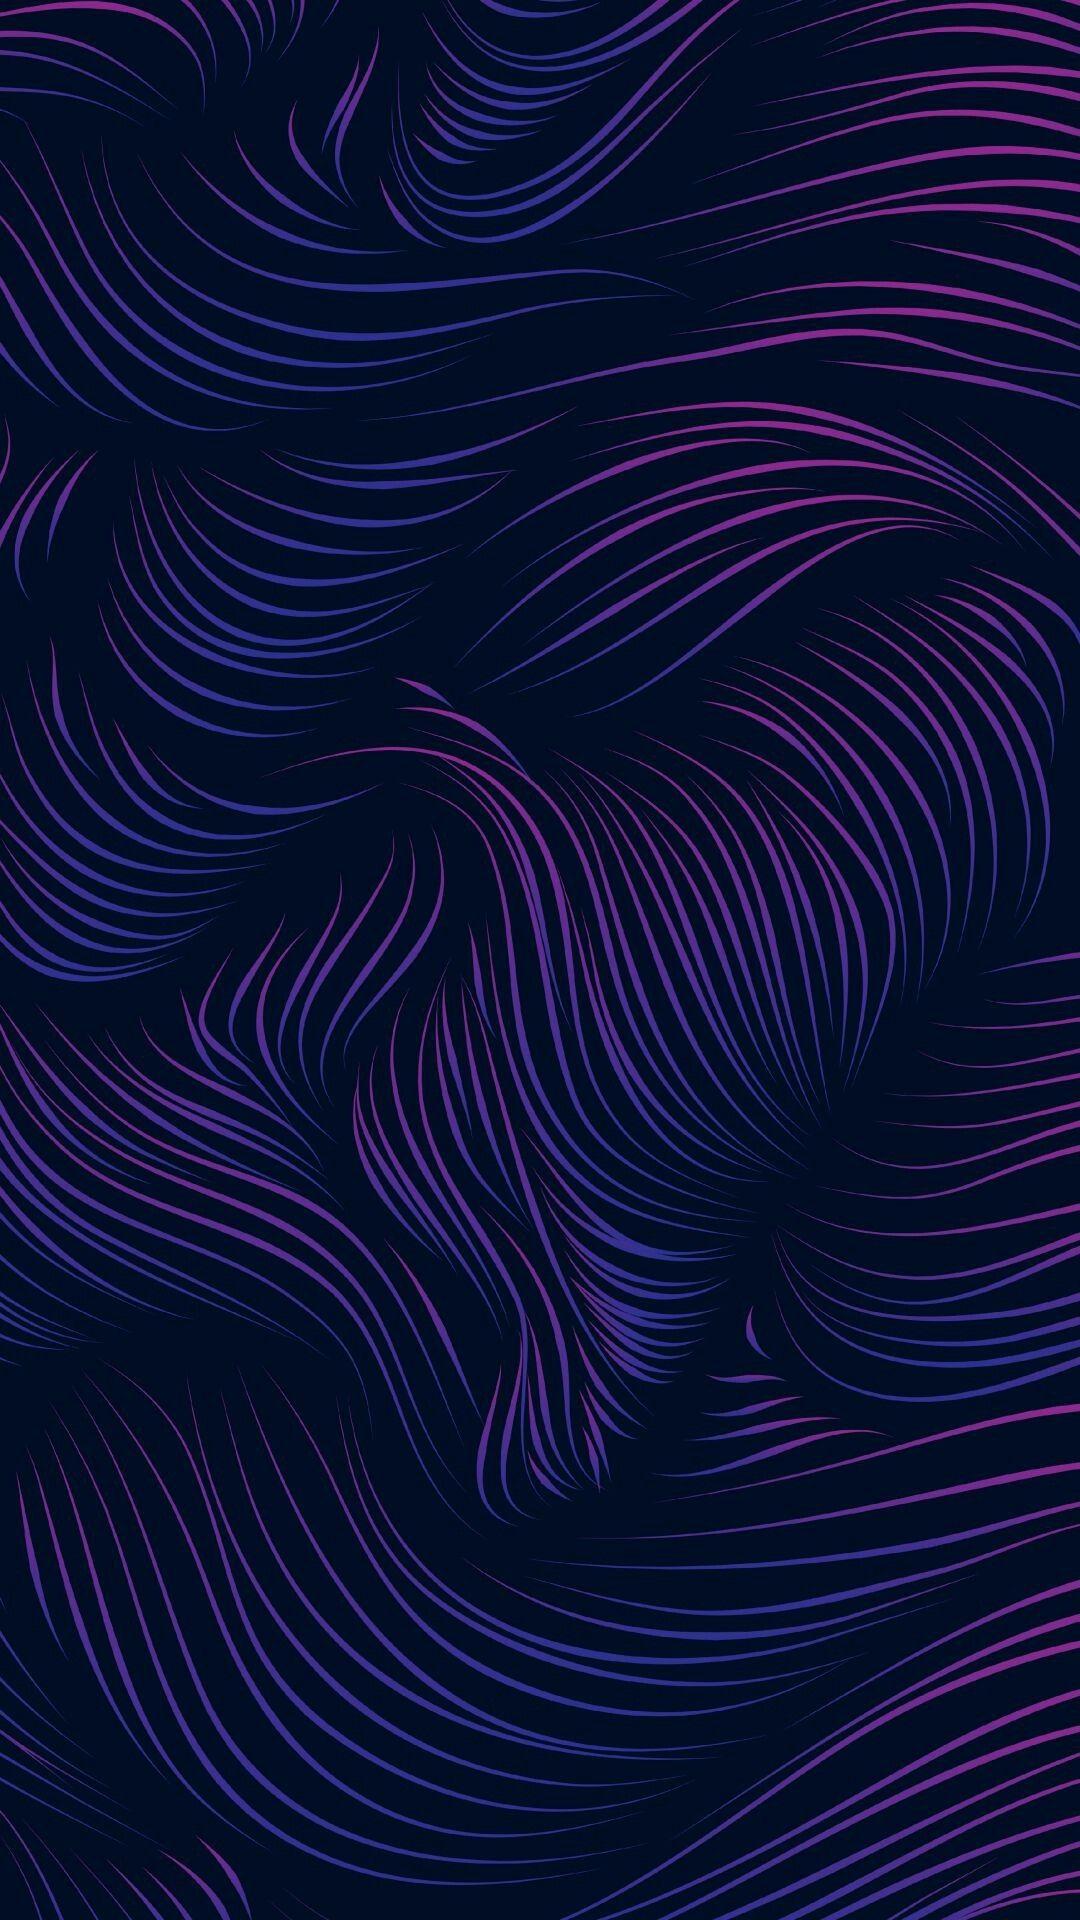 iphone wallpaper background purple pink swirl dark